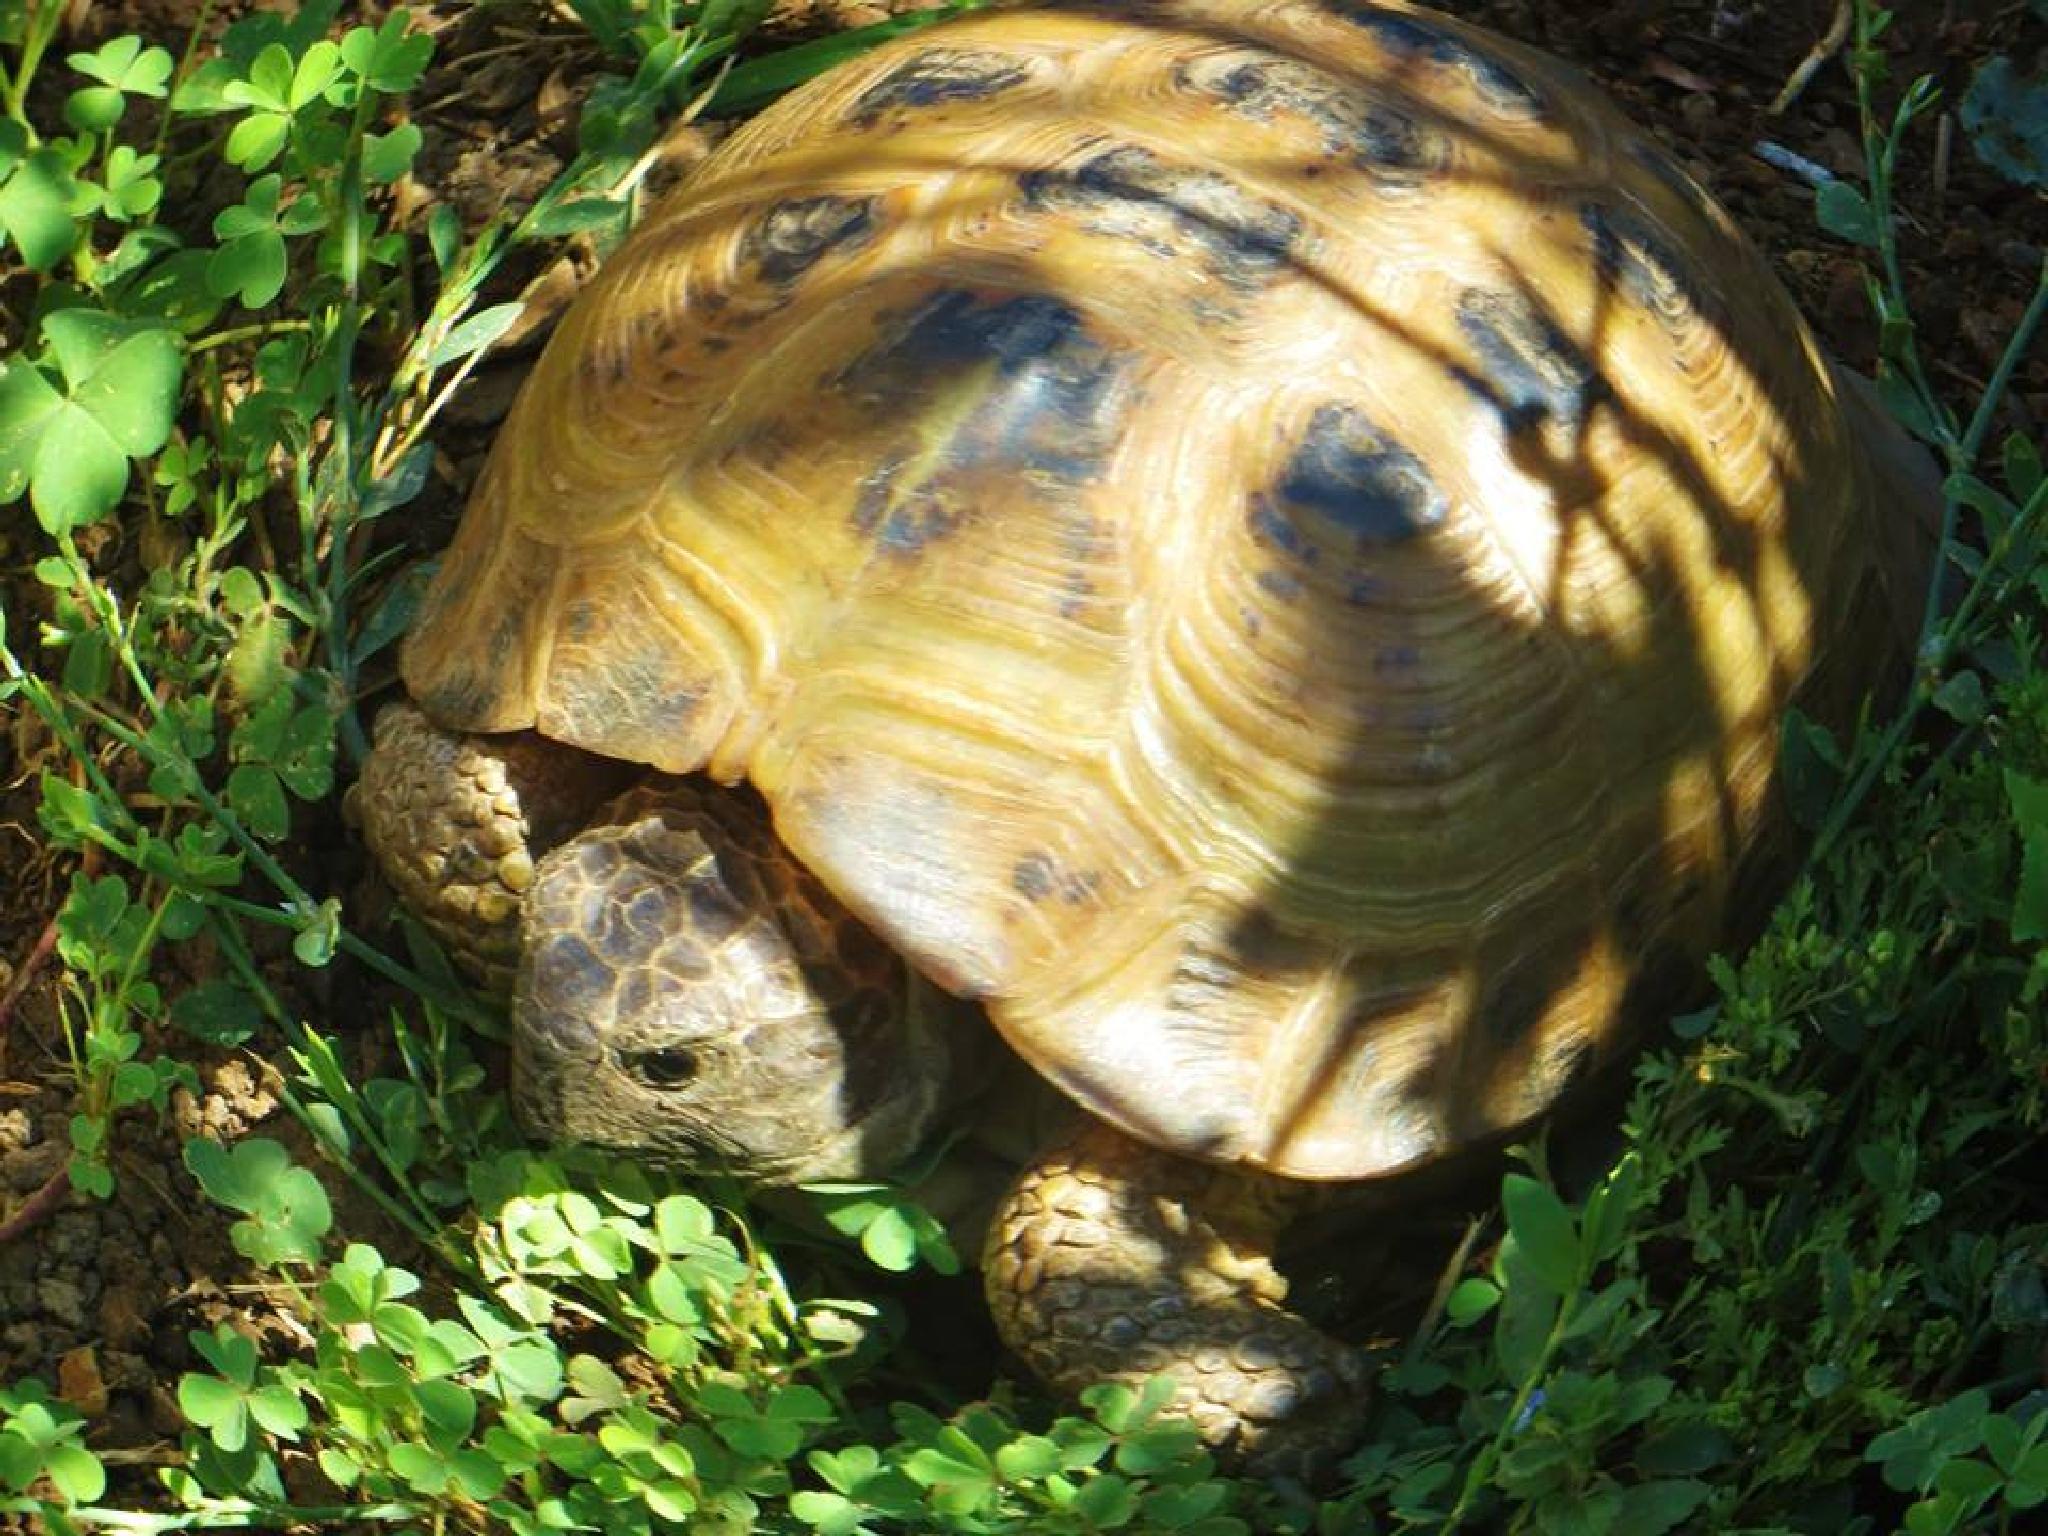 Mr. Turtle by Denise Fink